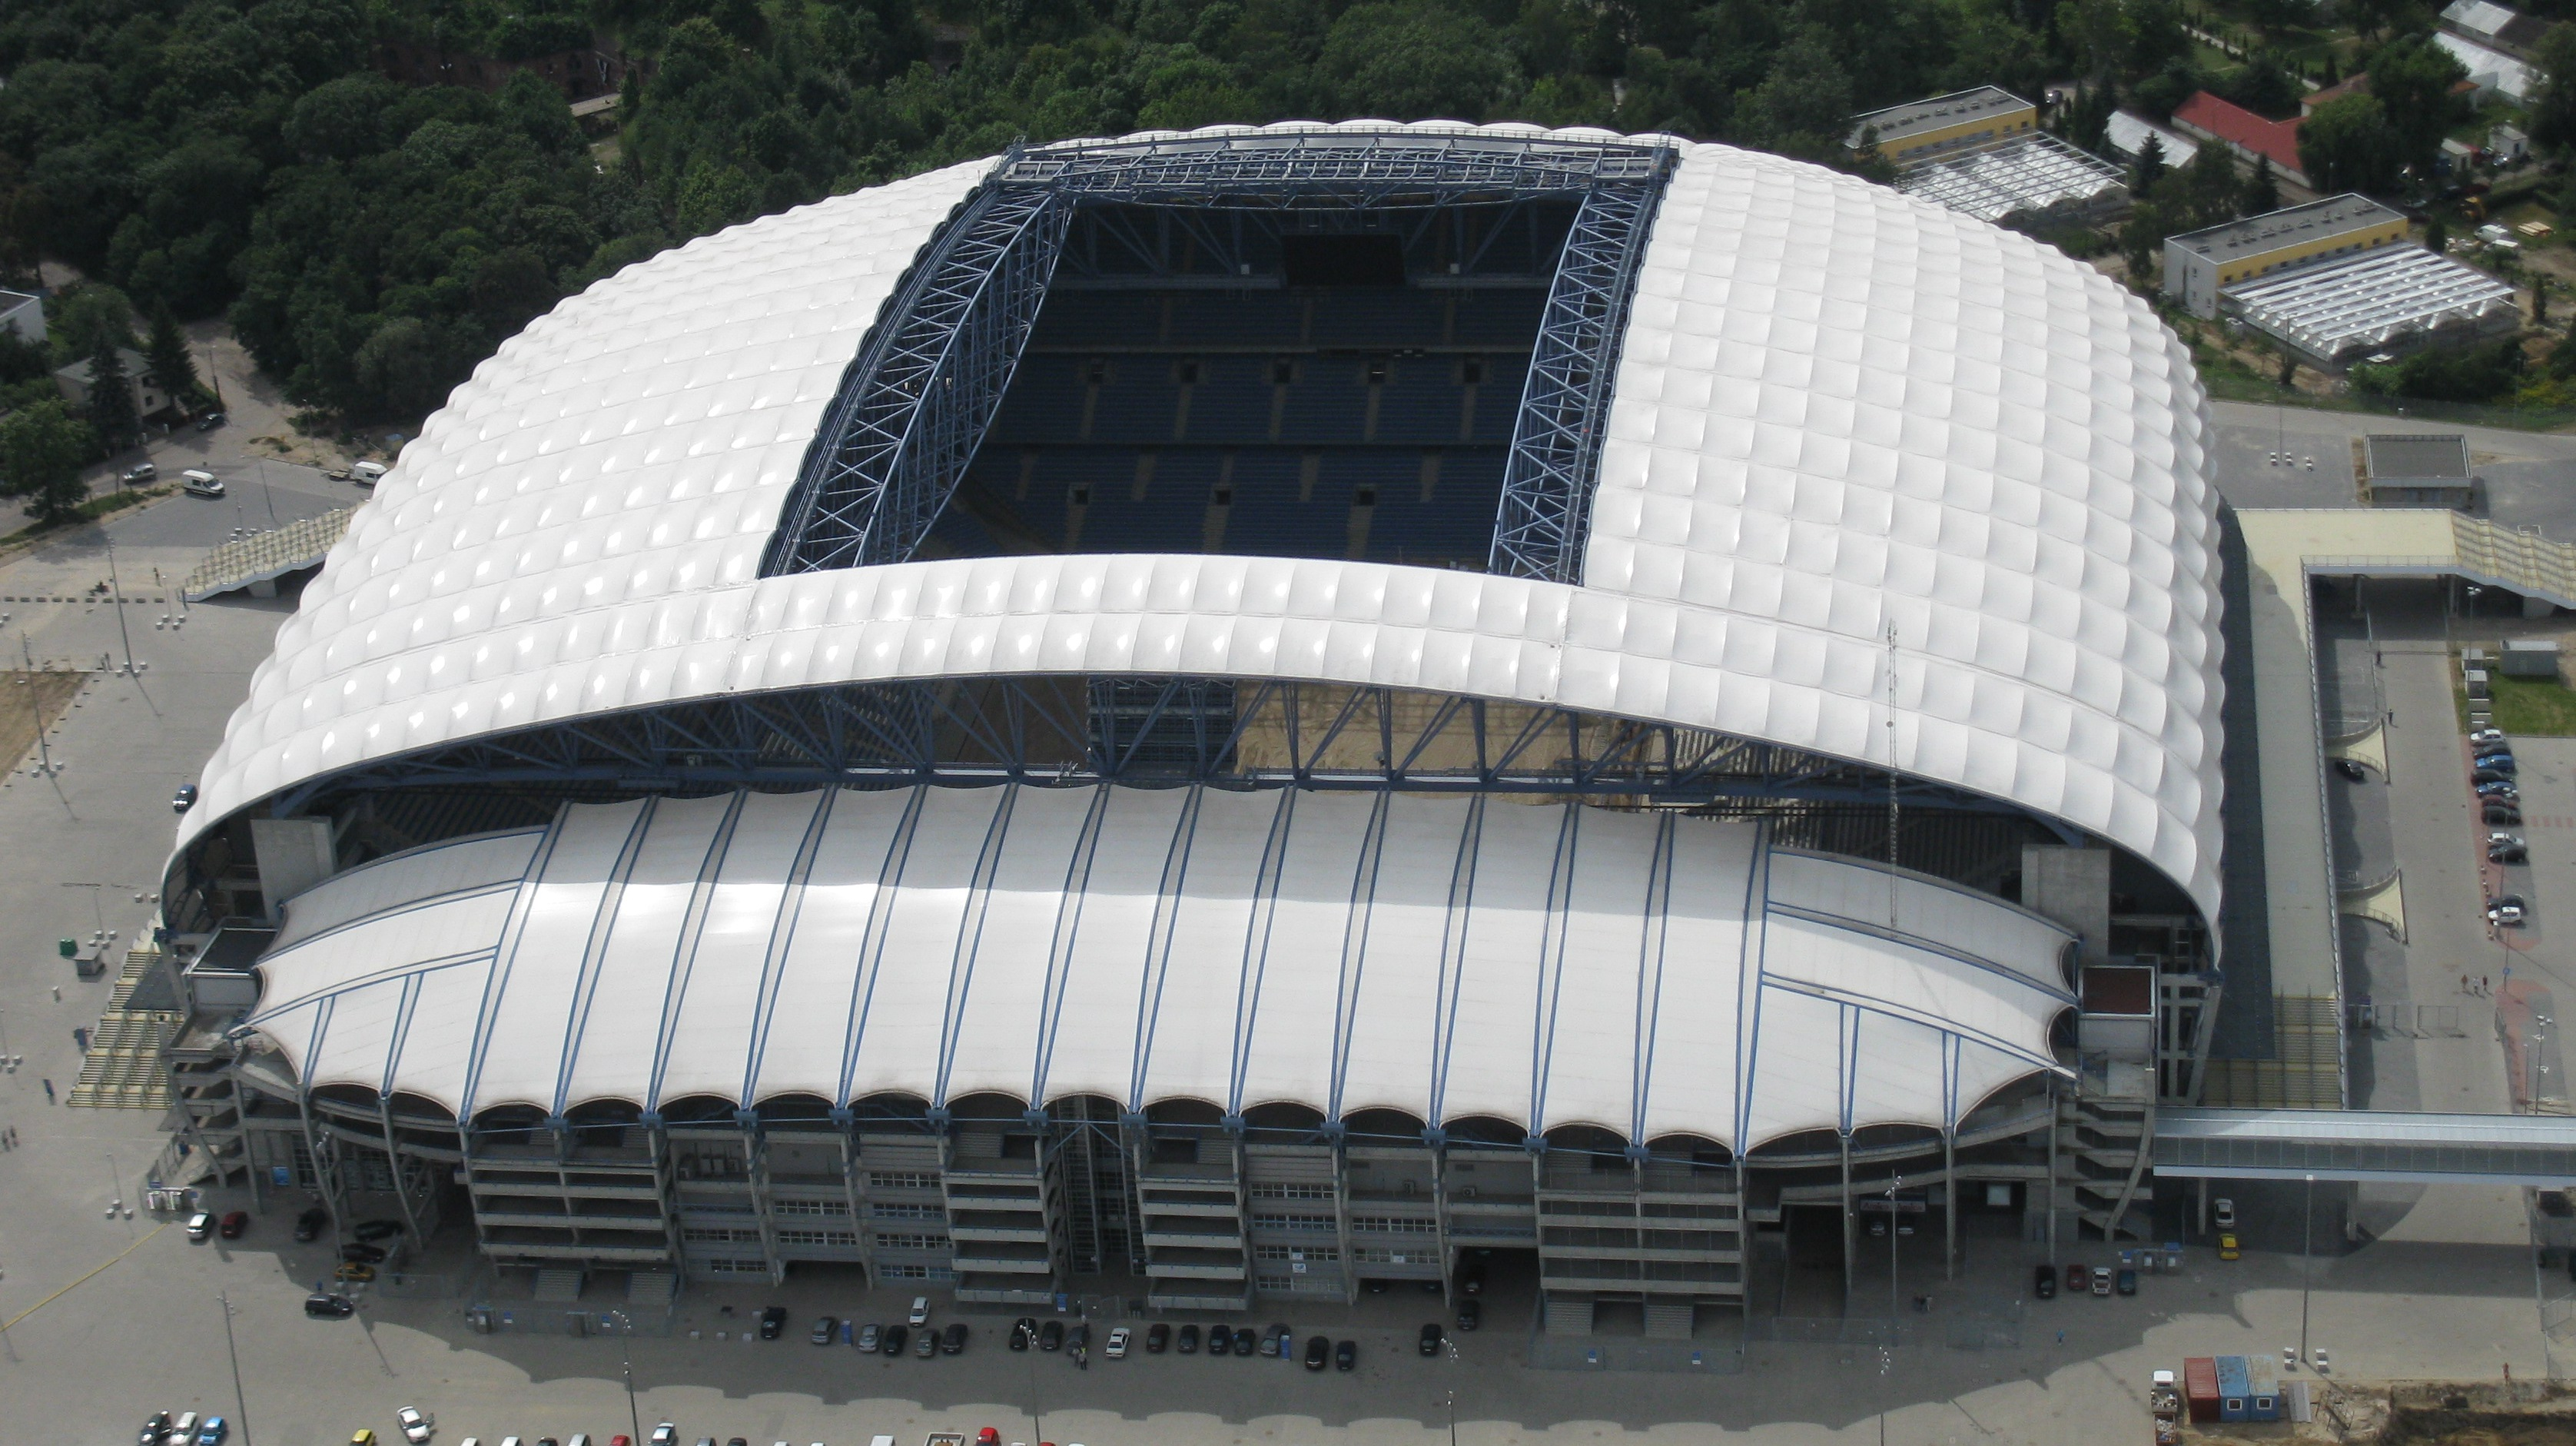 https://upload.wikimedia.org/wikipedia/commons/9/9c/Stadion_Miejski_Poznan%2C_2011-08-23.jpg